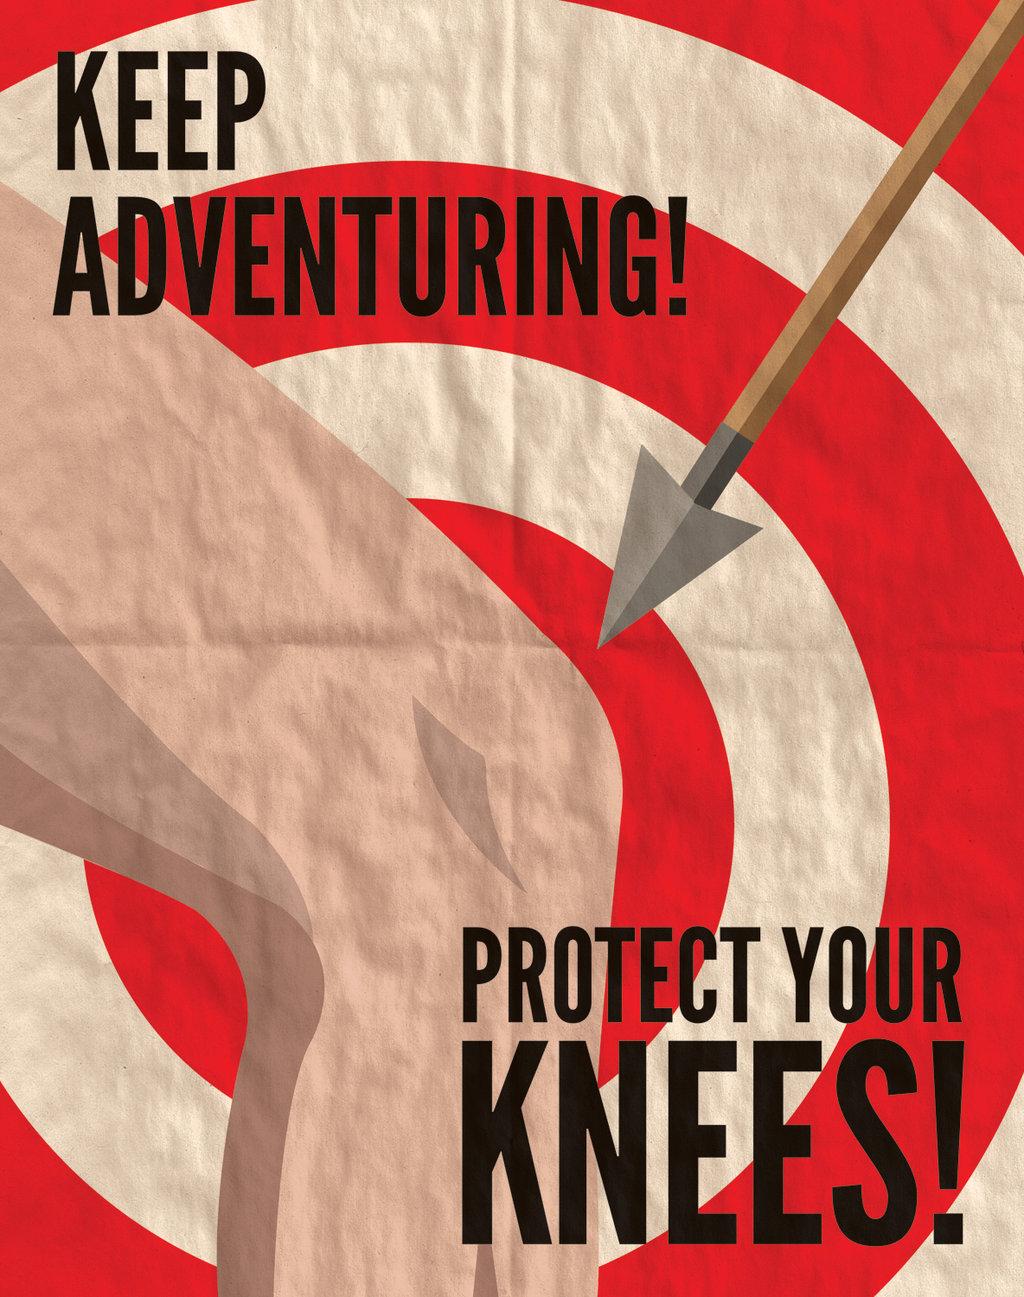 retro_skyrim_propaganda_poster_by_skullx-d57xmzz.jpg